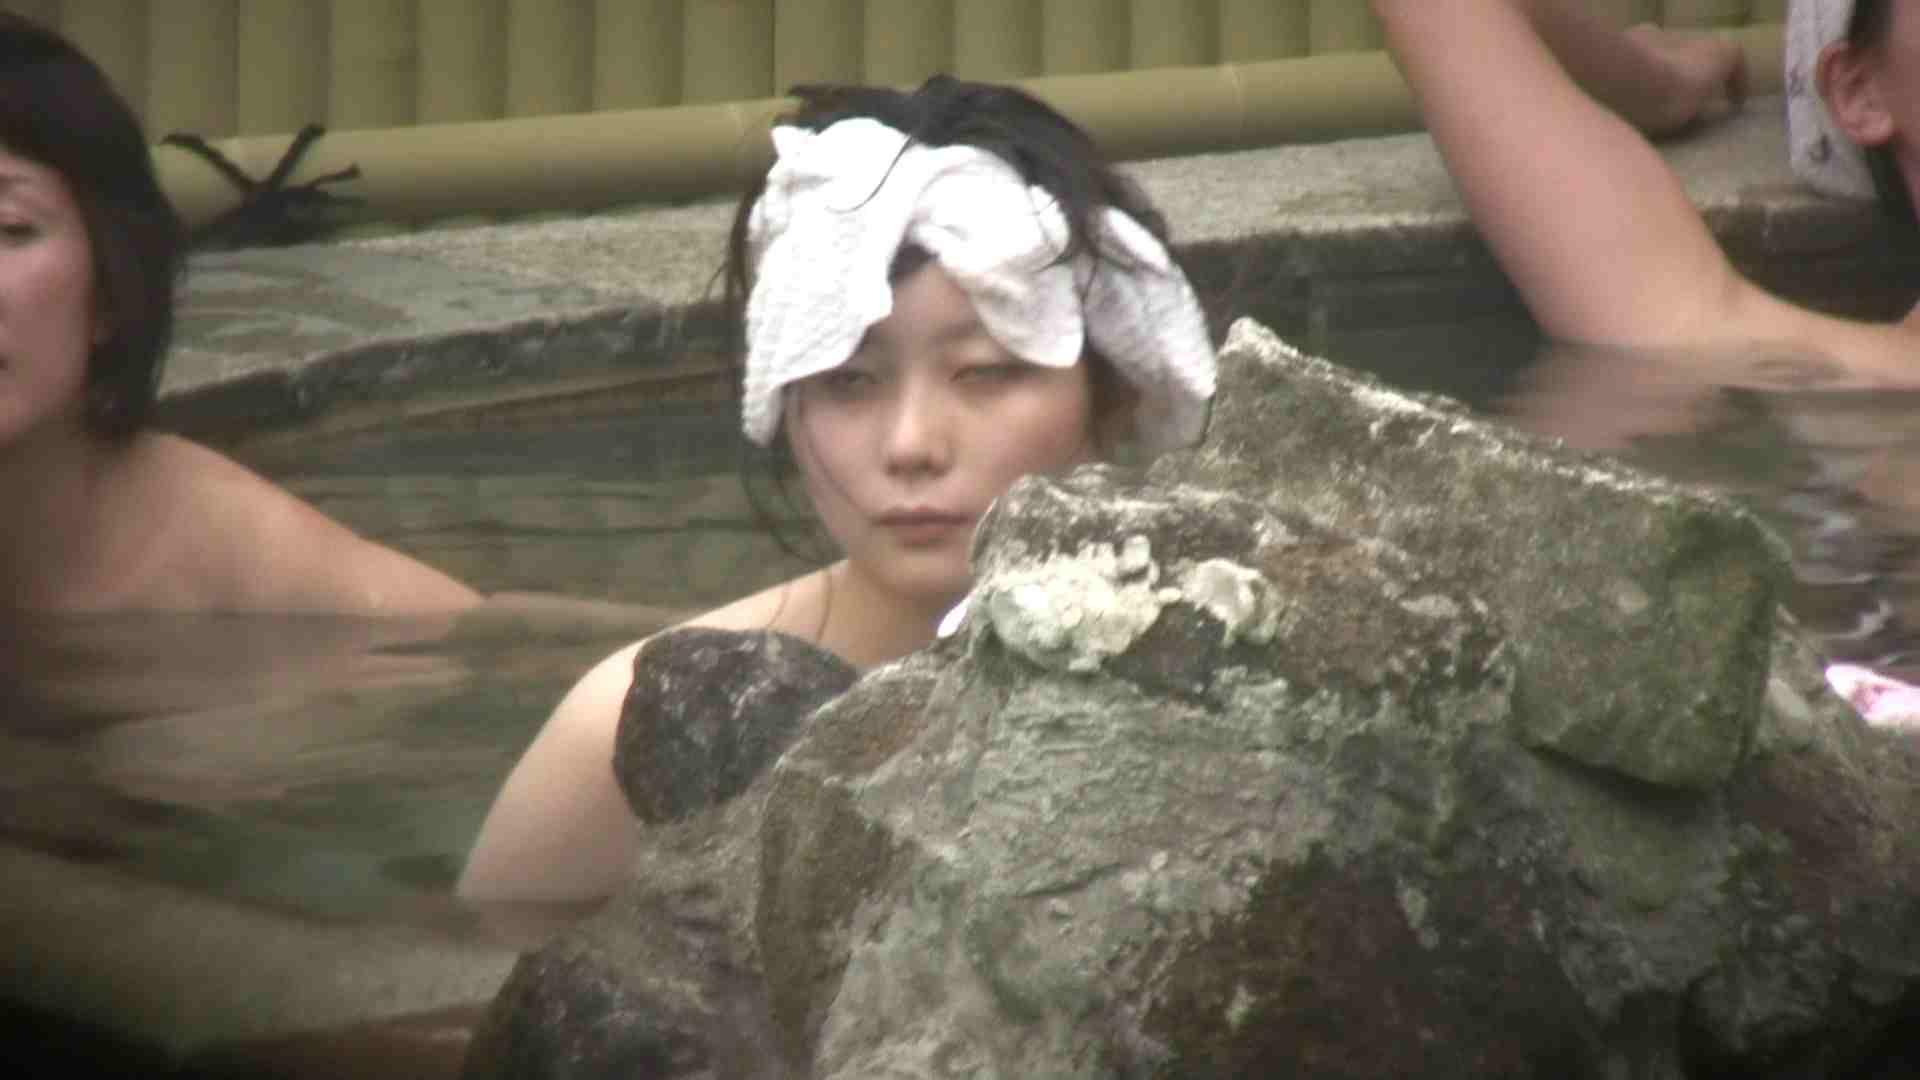 Aquaな露天風呂Vol.147 HなOL | 露天  103pic 1